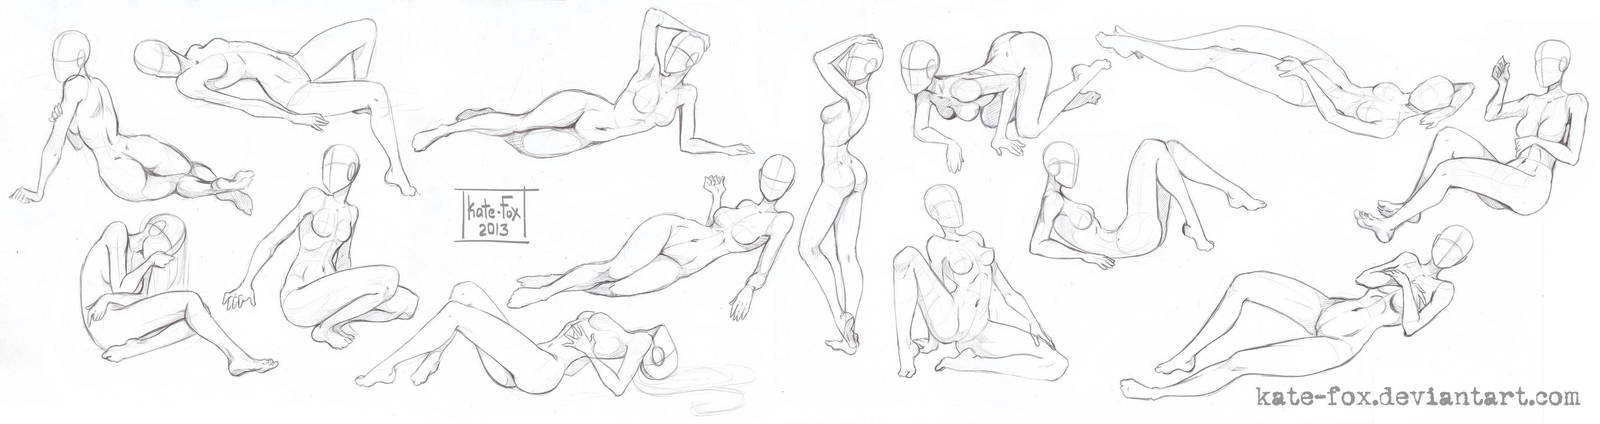 Pose study9 by Kate-FoX